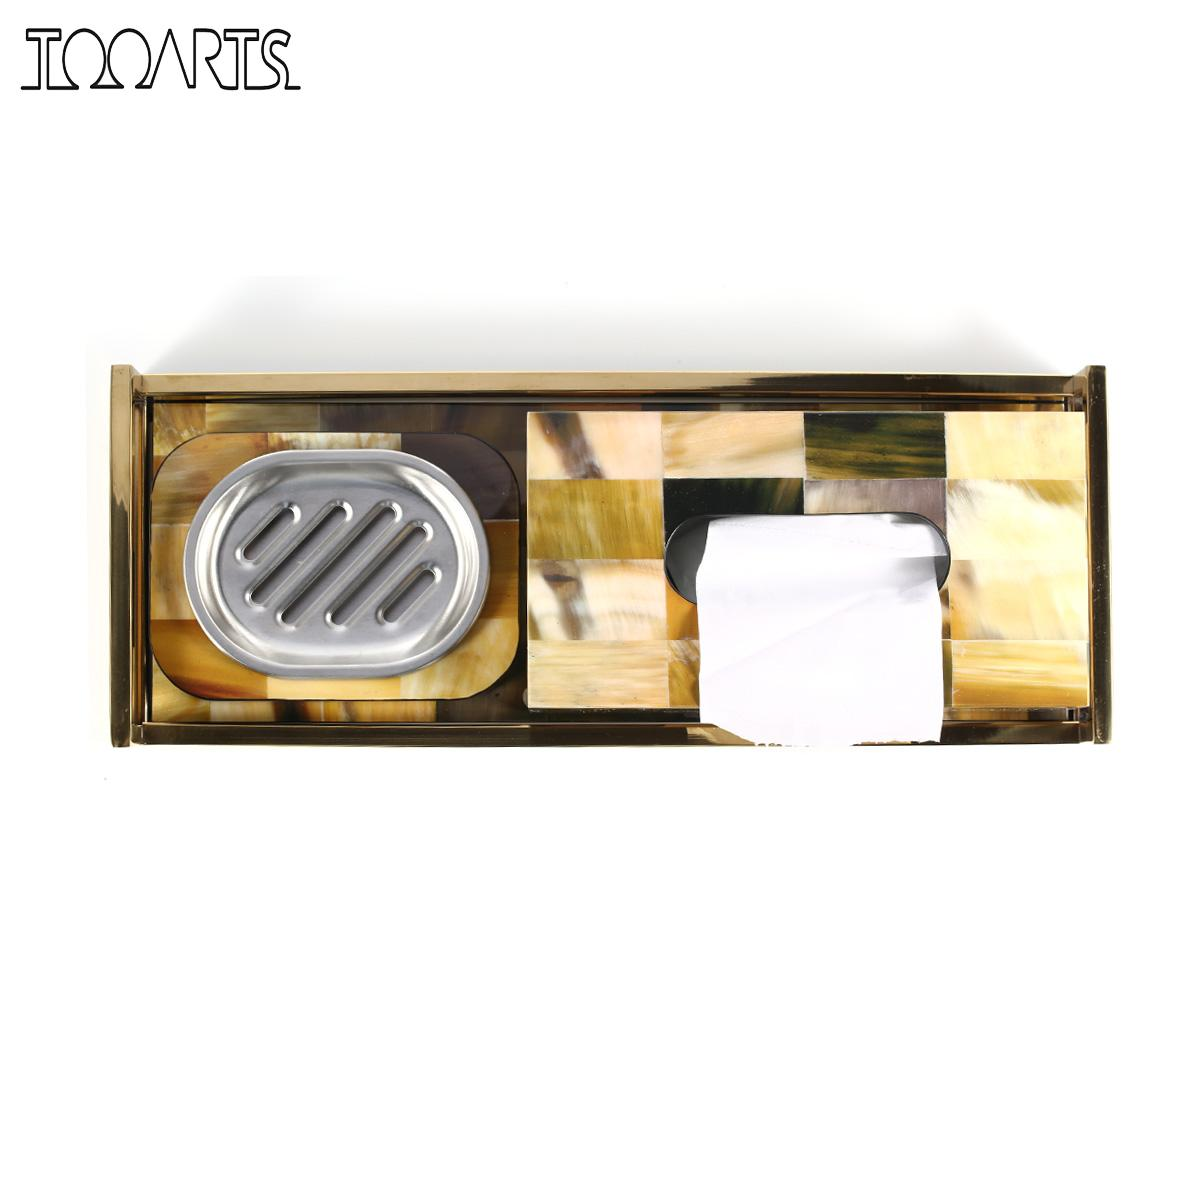 Tooarts Rectangular Tray with Horn Stripes(Small Size) Wooden Piano Baking Varnish Technology Tea Tray Fruit Tray Coffee Tray